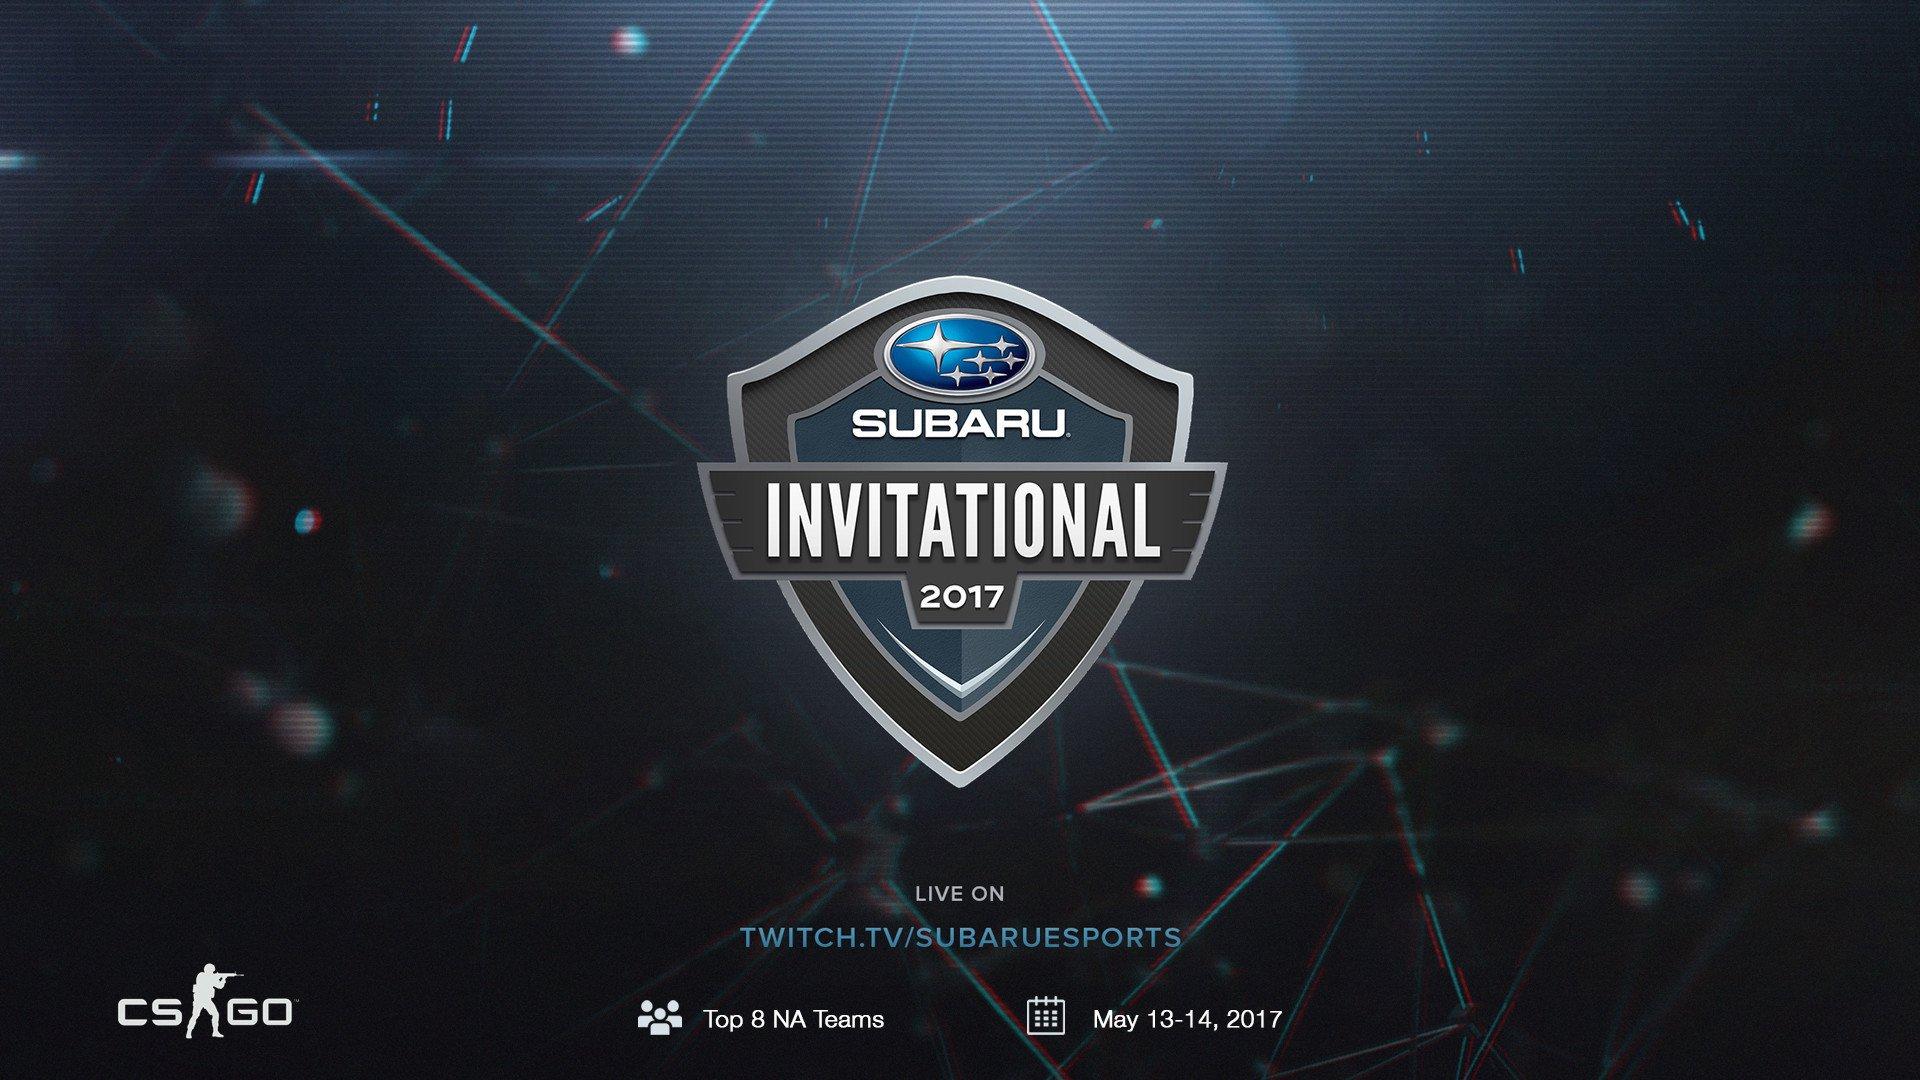 TNL eSports Brand Tracker 008: Subaru Invitational 2017 (Photo: SubaruEsports TwitchTV)